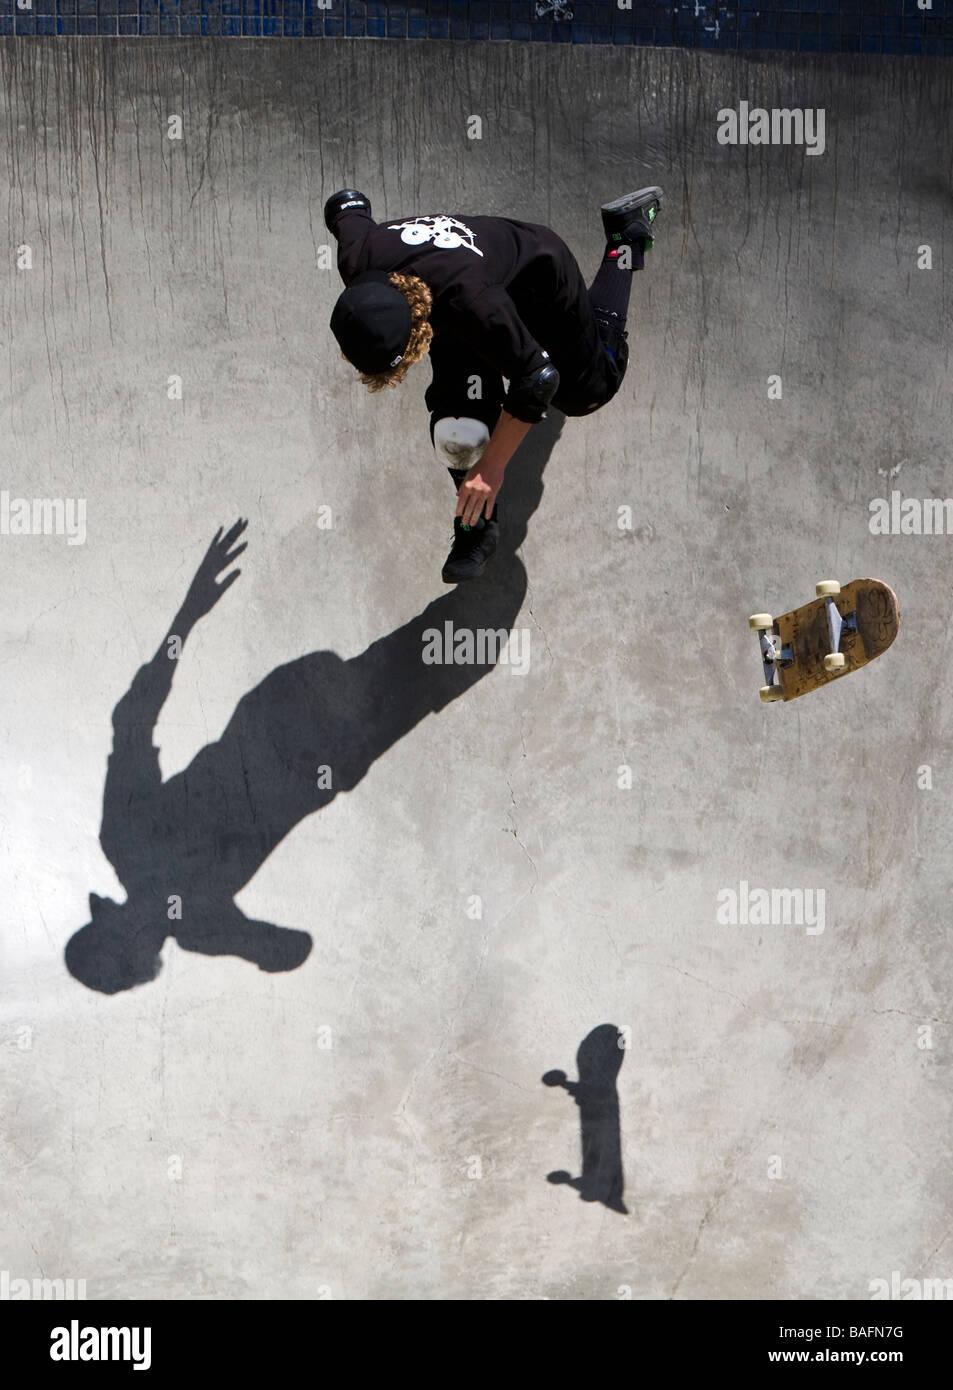 Skateboarder doing tricks Culver City Skateboard Park Culver City Los Angeles County California United States of Stock Photo